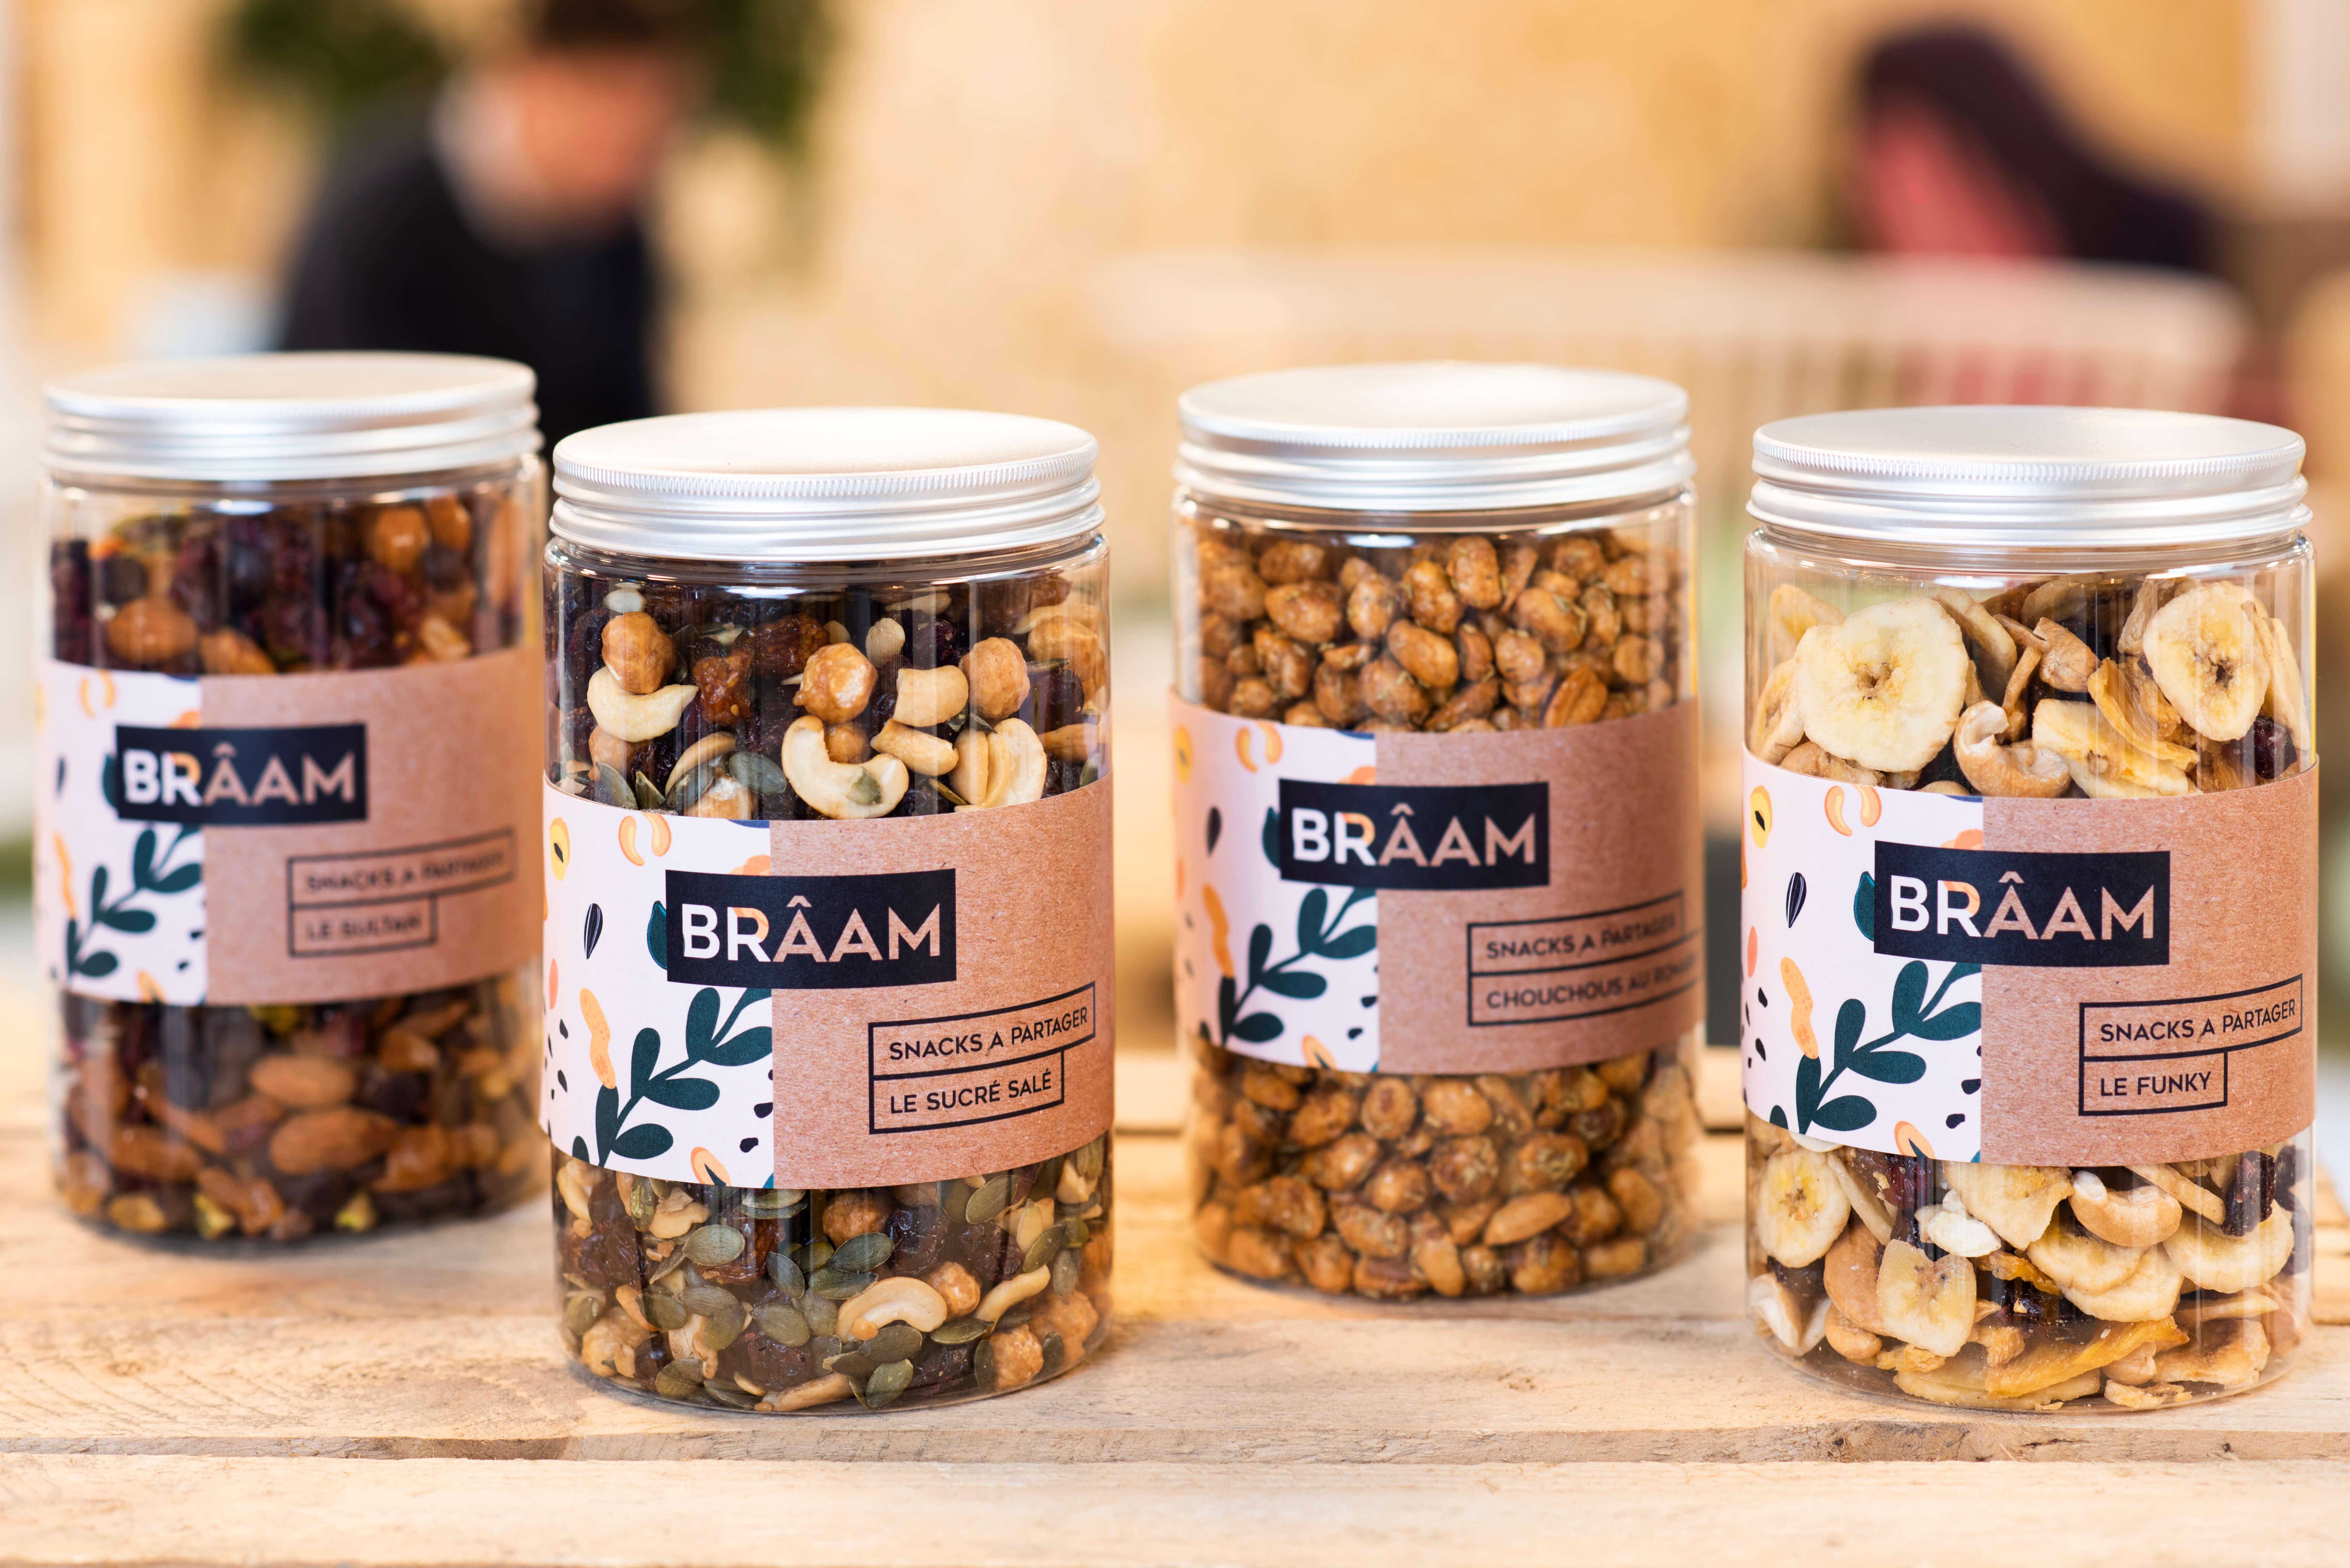 barattoli cereali braam sostenibili